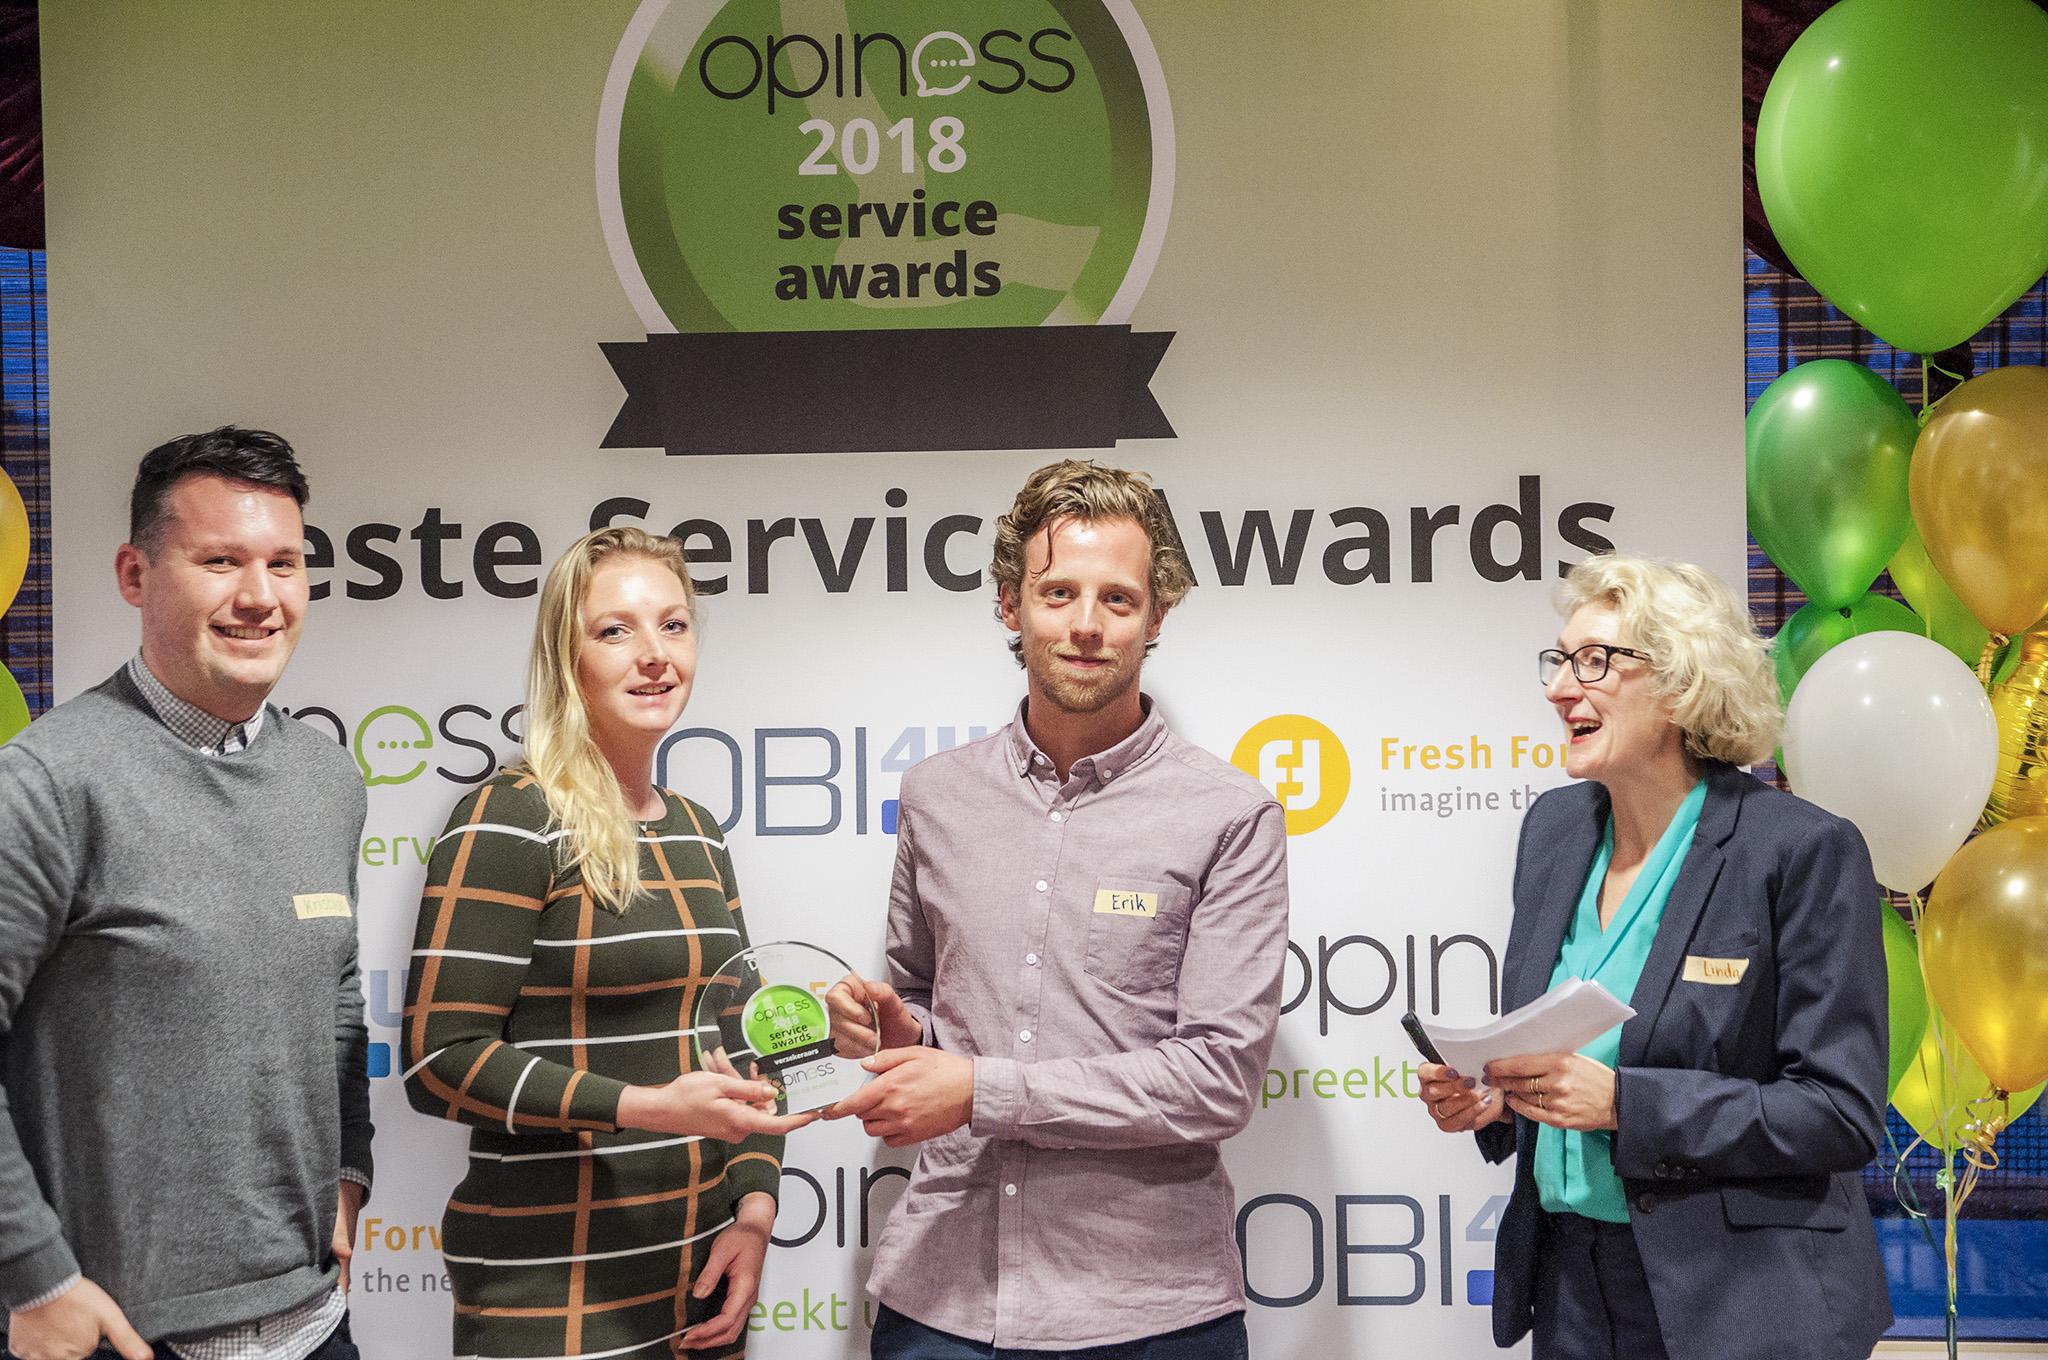 Winnaar Ditzo Opiness Service Award